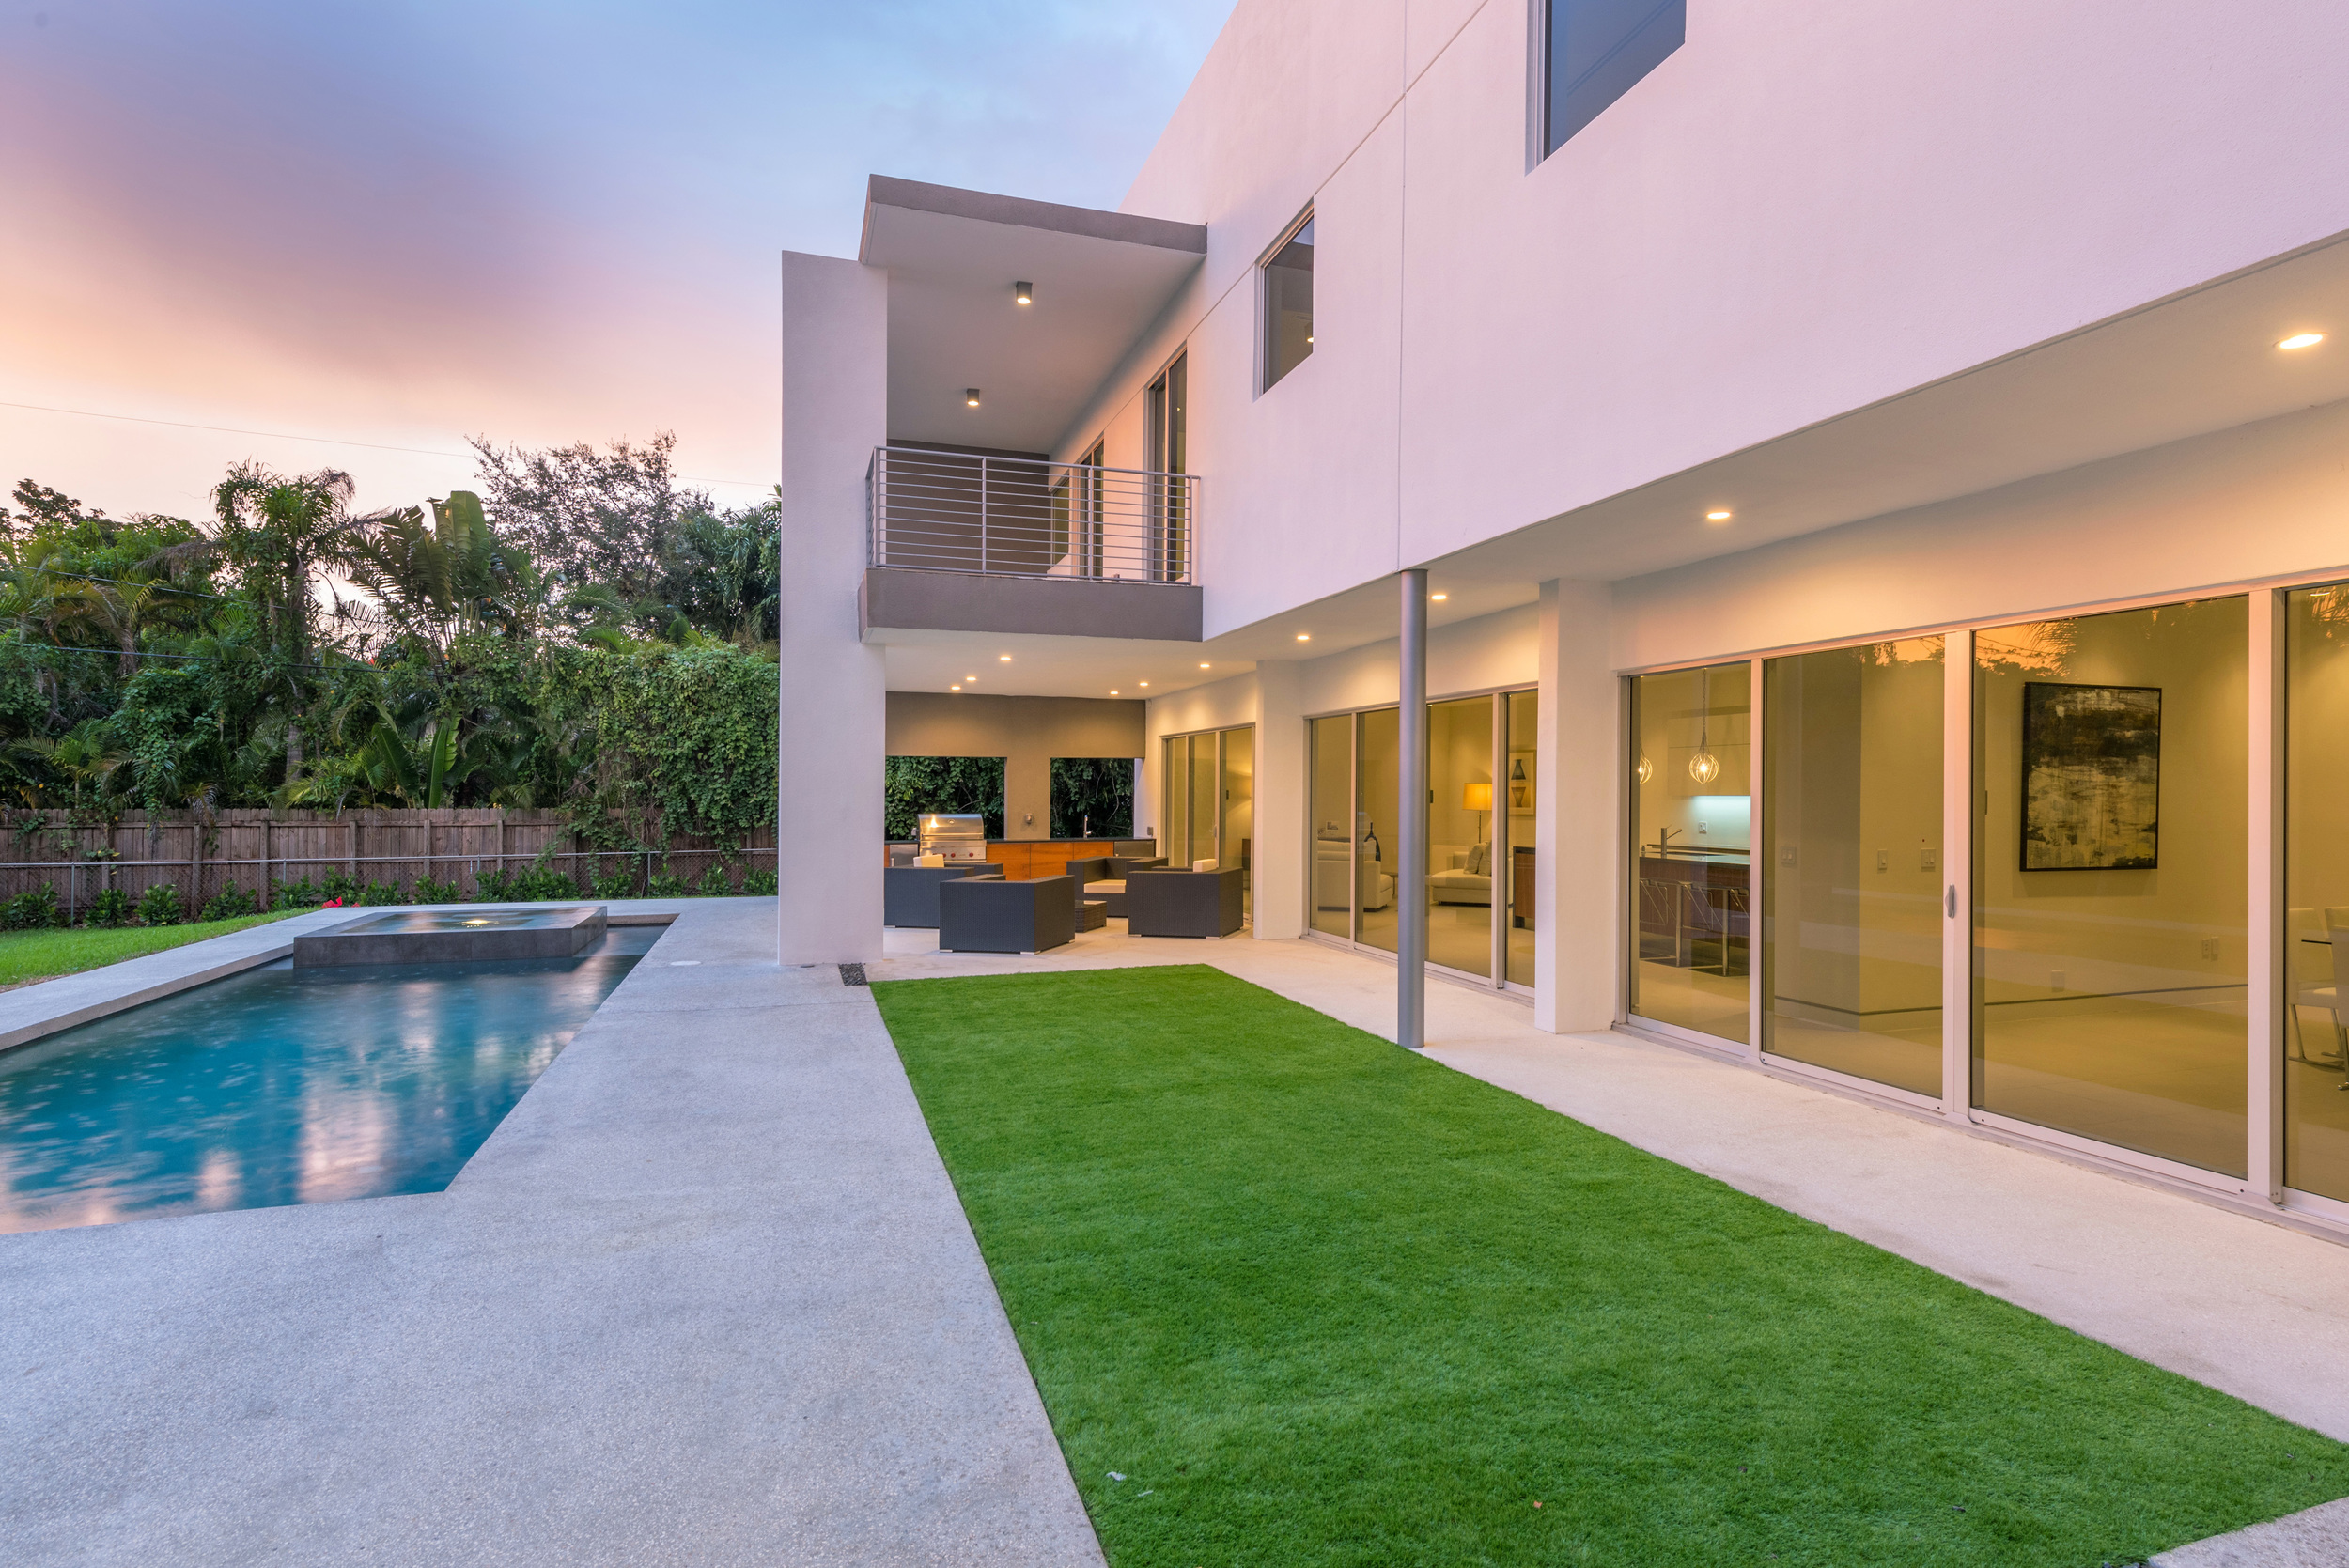 The Setting Homes Plum House Miami Florida Exterior Rear Dusk TARIS Real Estate